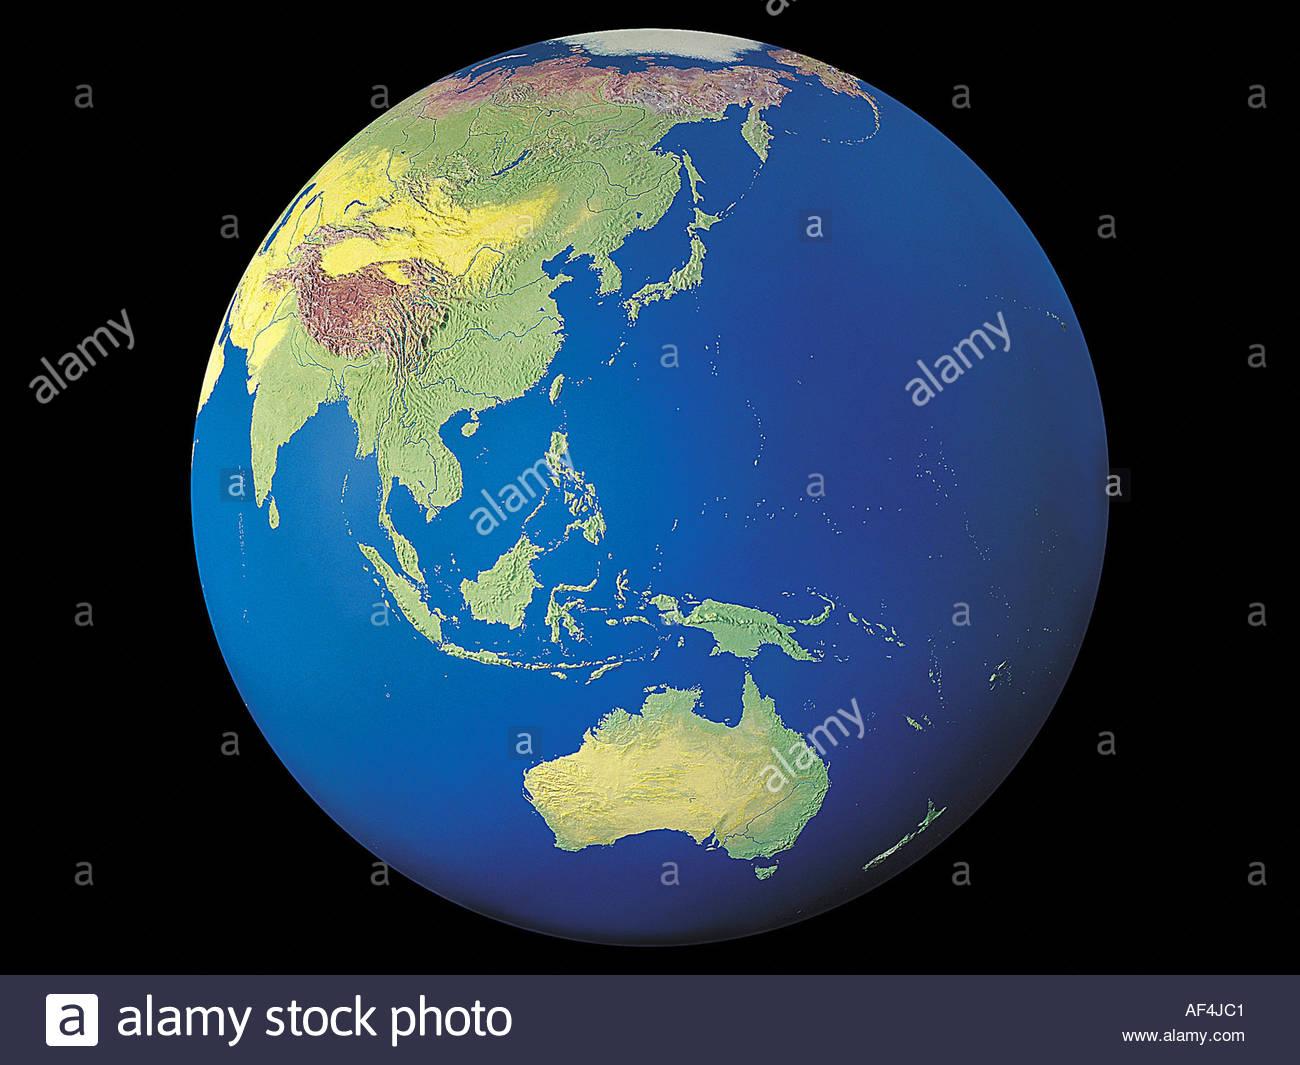 Globe globes map maps asia australia china indochina stock photo globe globes map maps asia australia china indochina gumiabroncs Choice Image